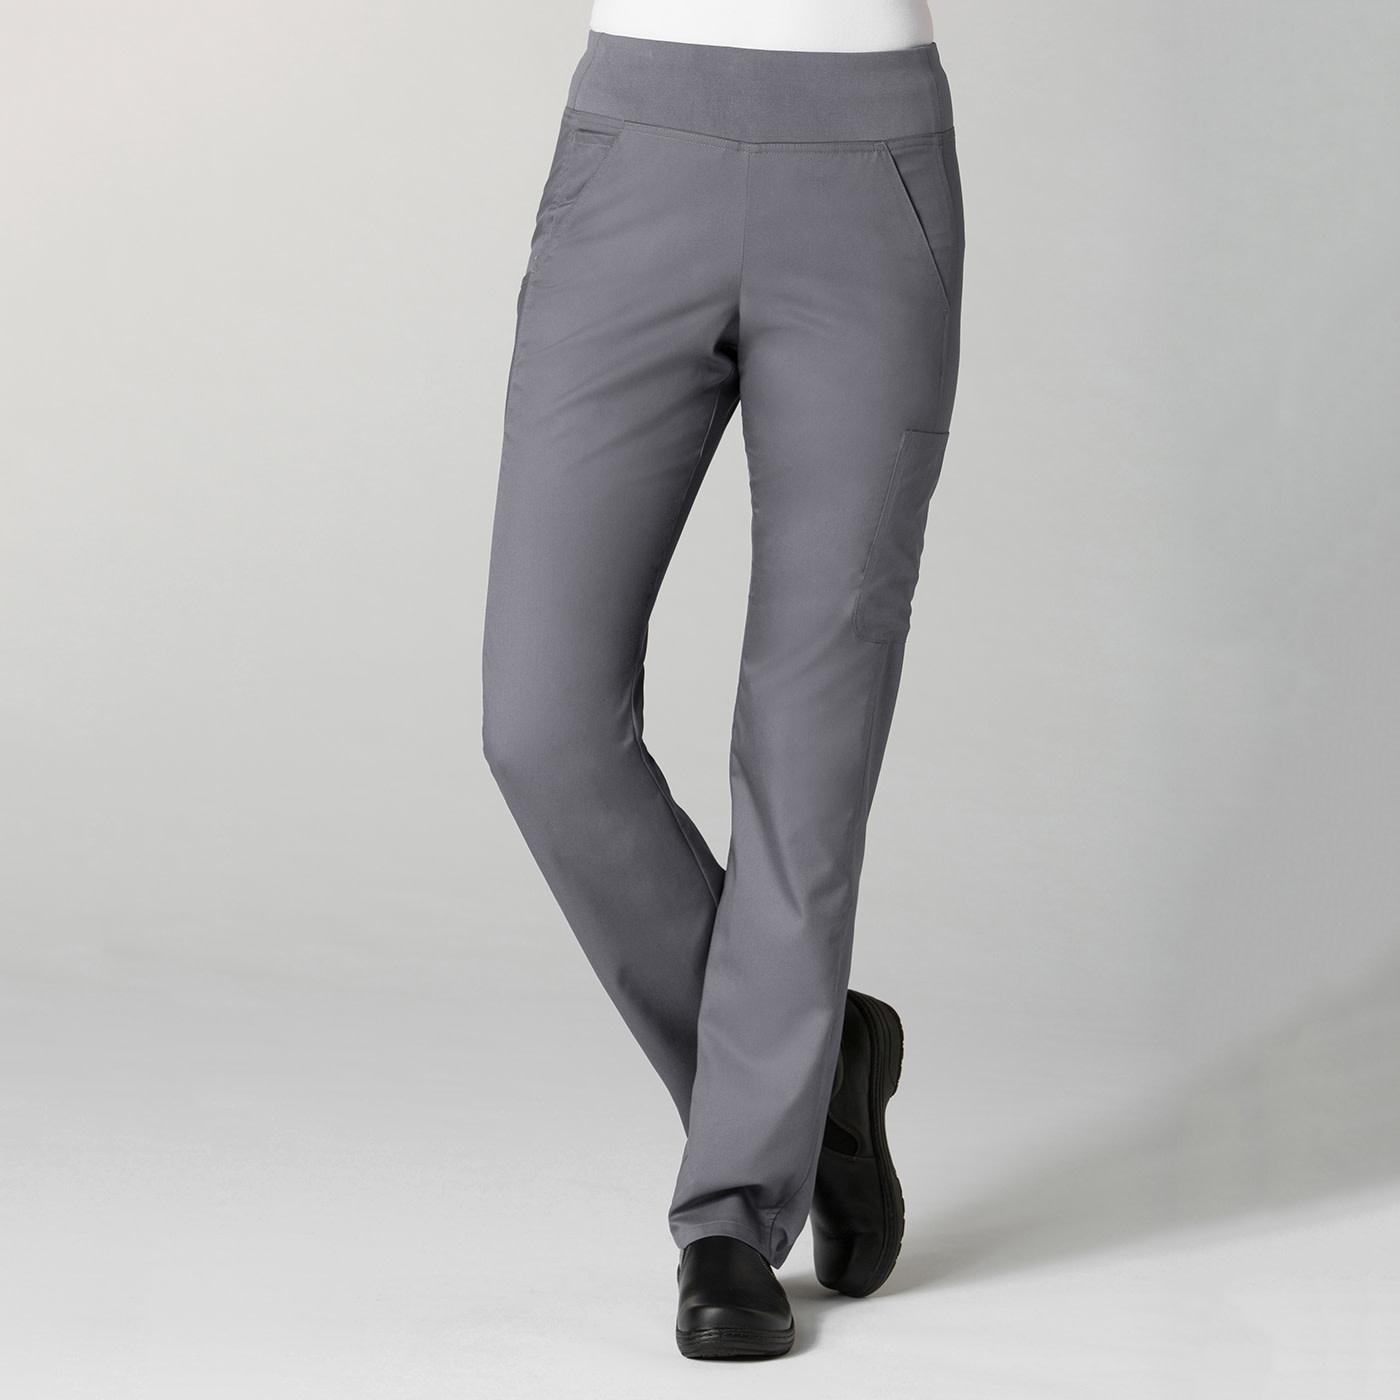 Pewter Grey Pure Yoga 7-Pocket Women's Scrub Pants 7338